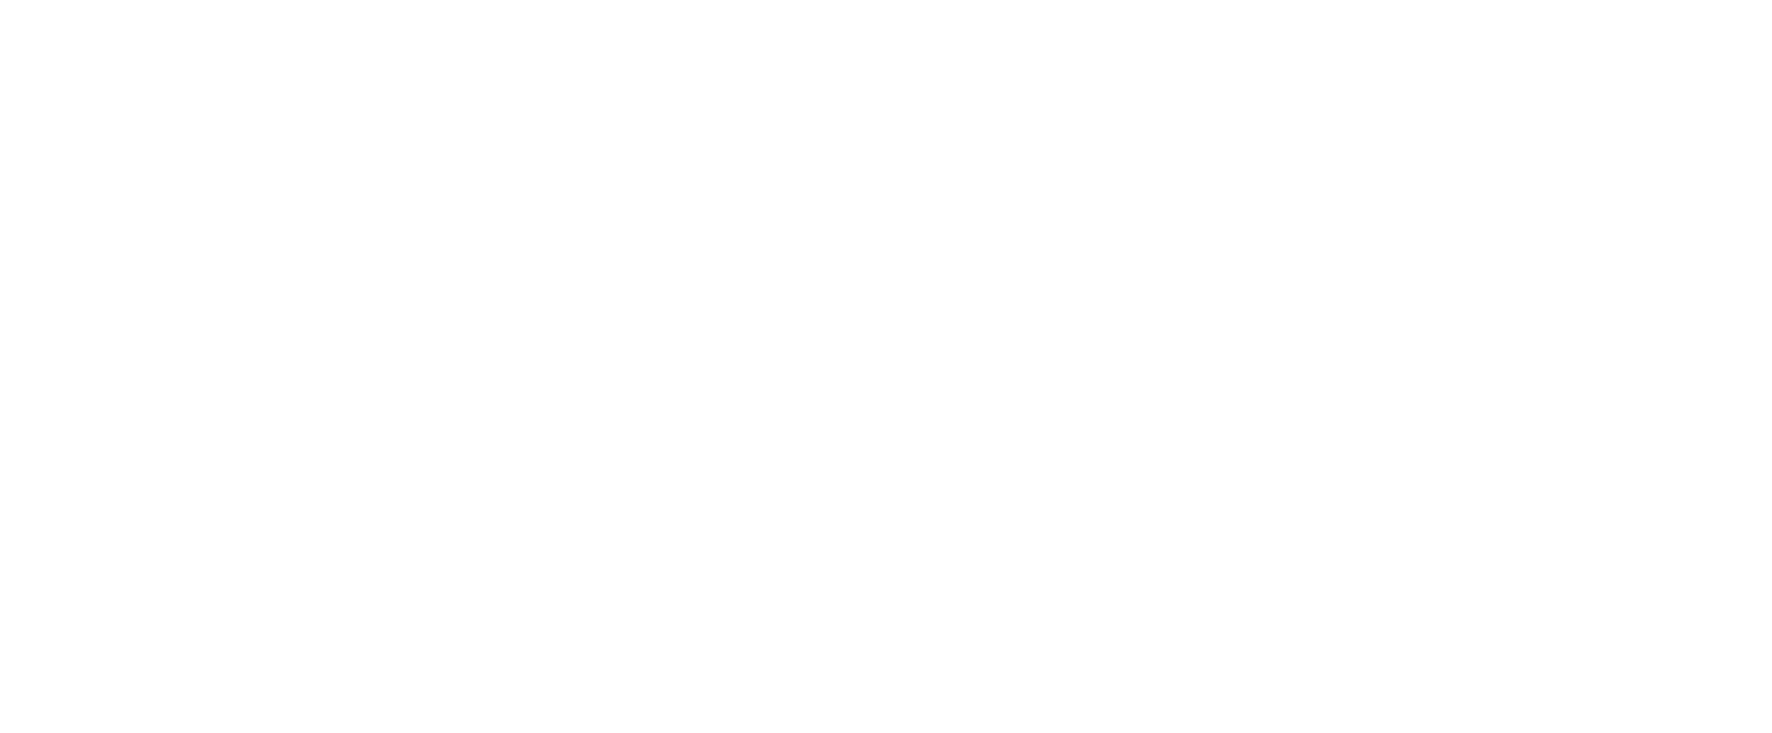 Dieli . Murawka . Howe